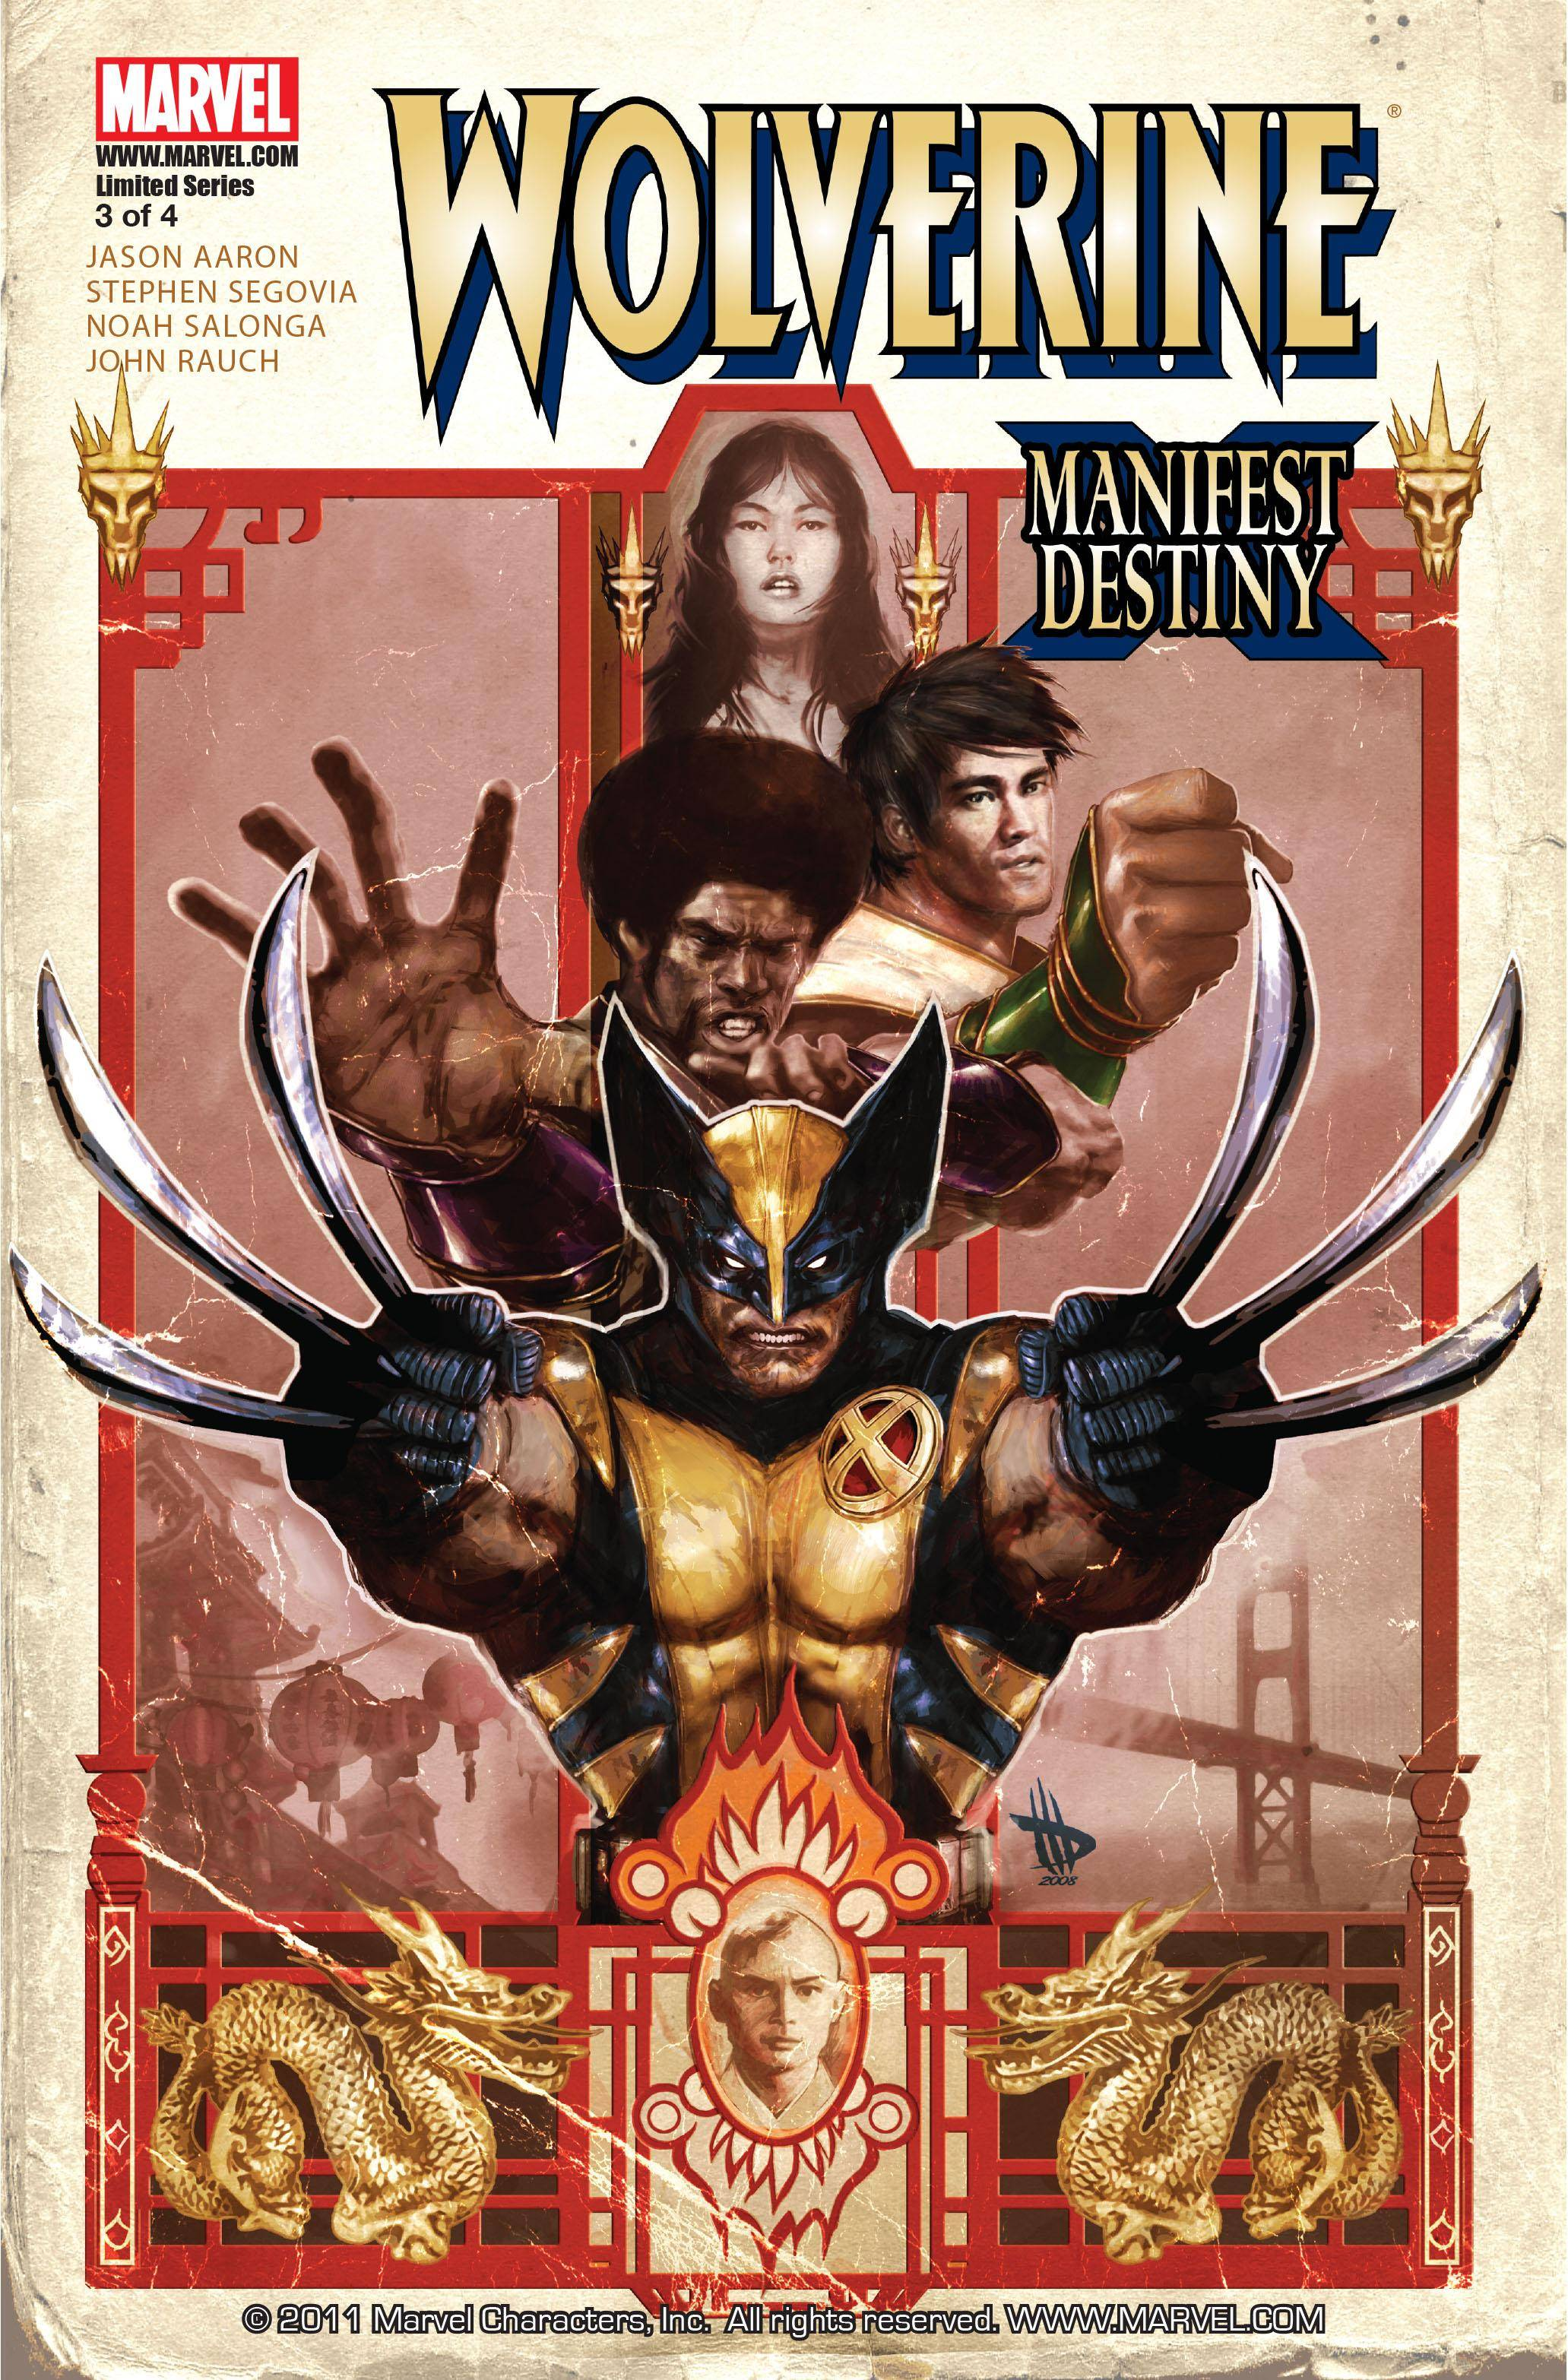 New Releases 2015 3 1 - Wolverine - Manifest Destiny 03 of 04 2009 Digital-Empire cbr